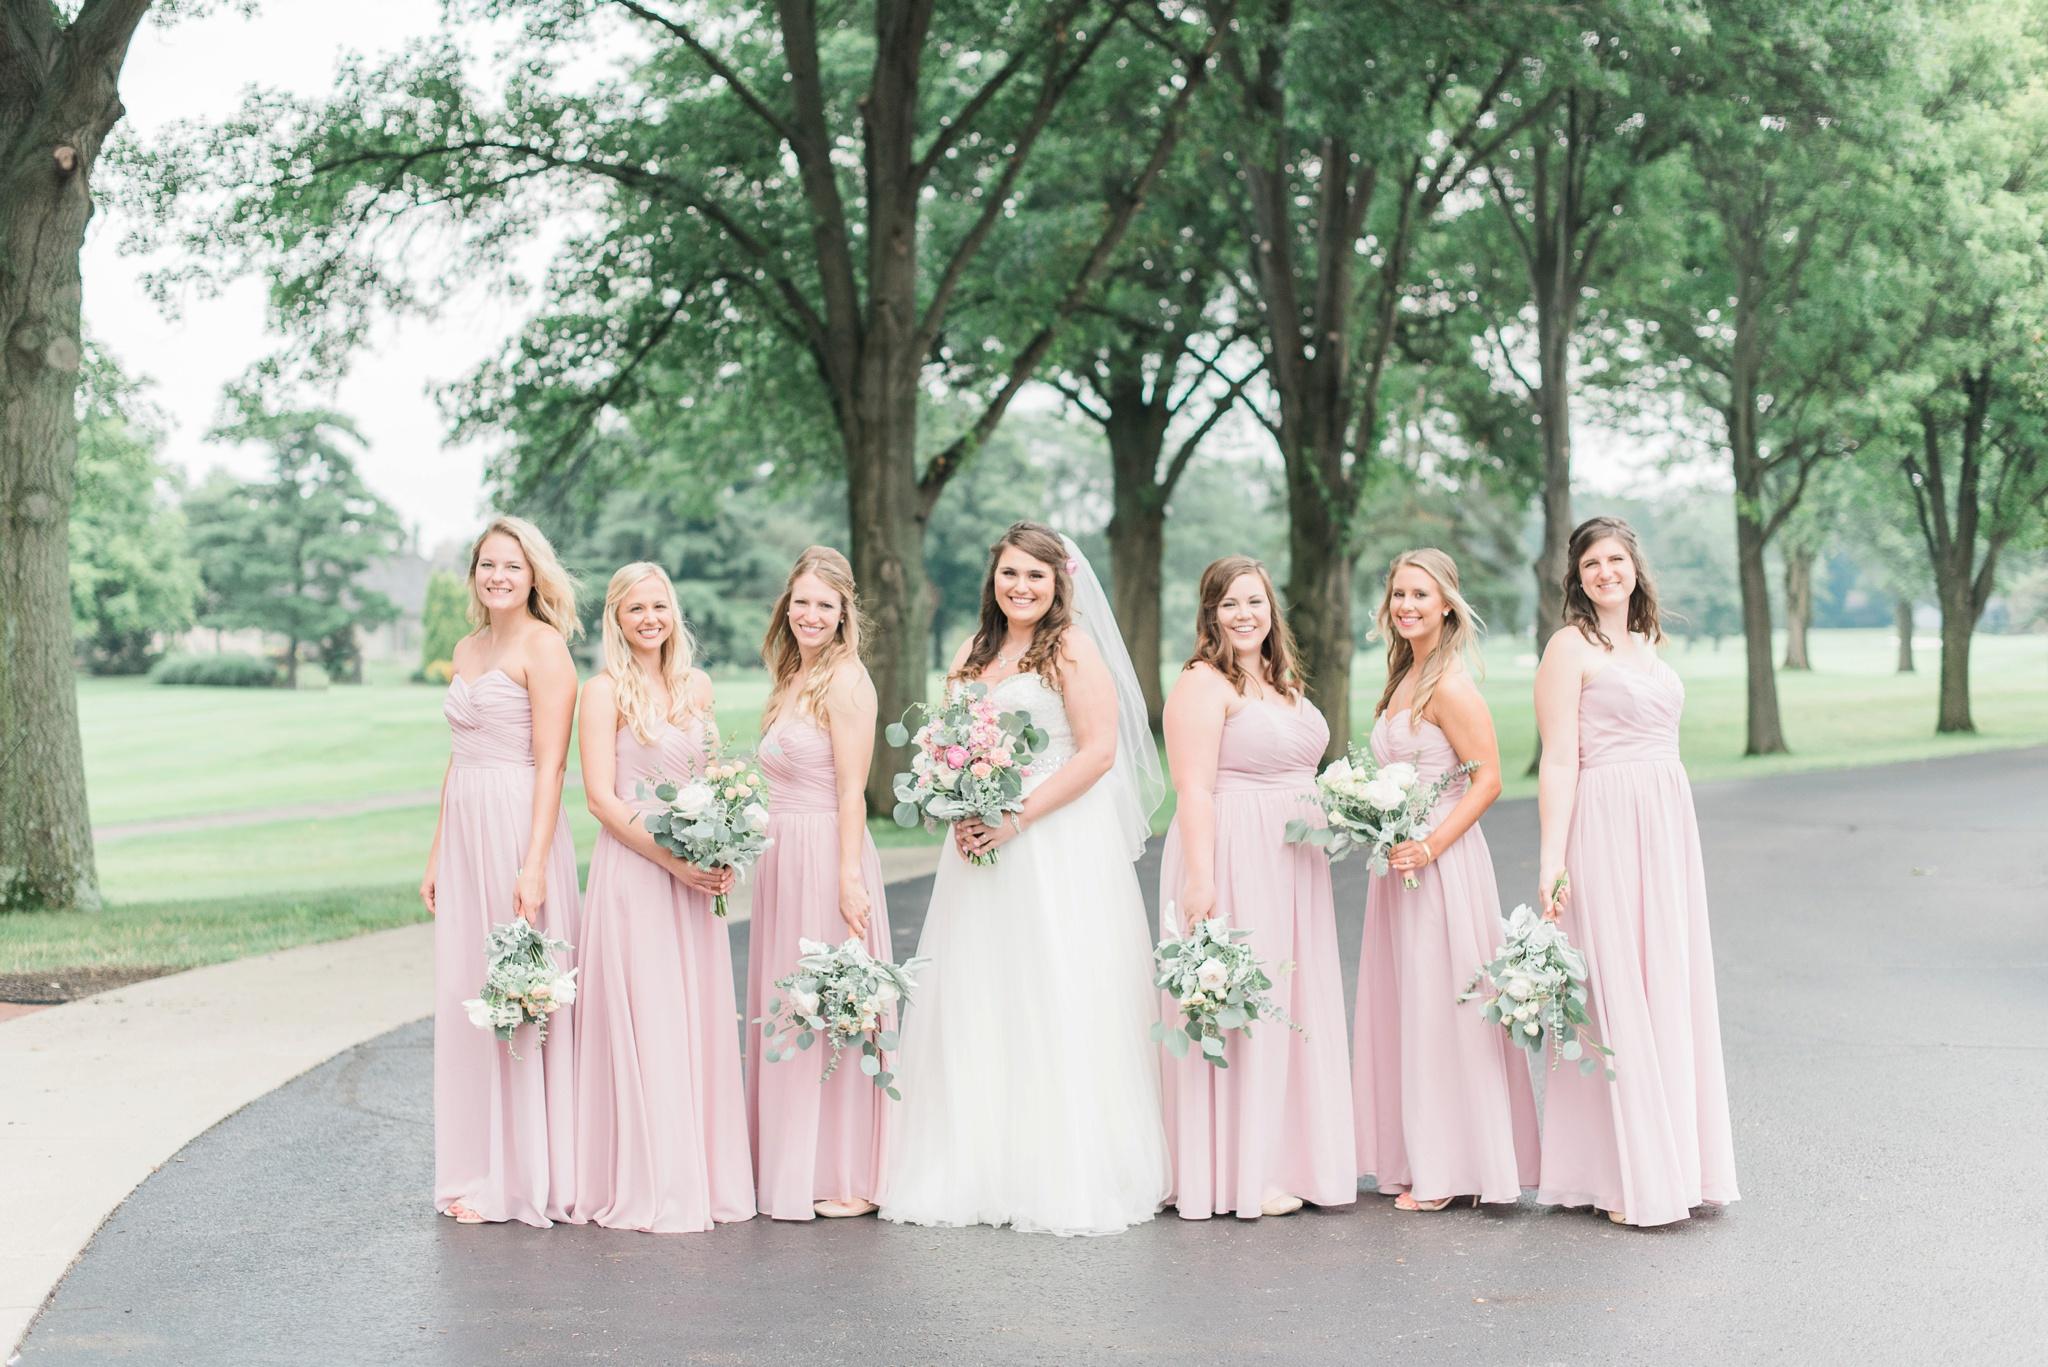 worthington-hills-country-club-wedding-columbus-ohio-meg-evan_0024.jpg